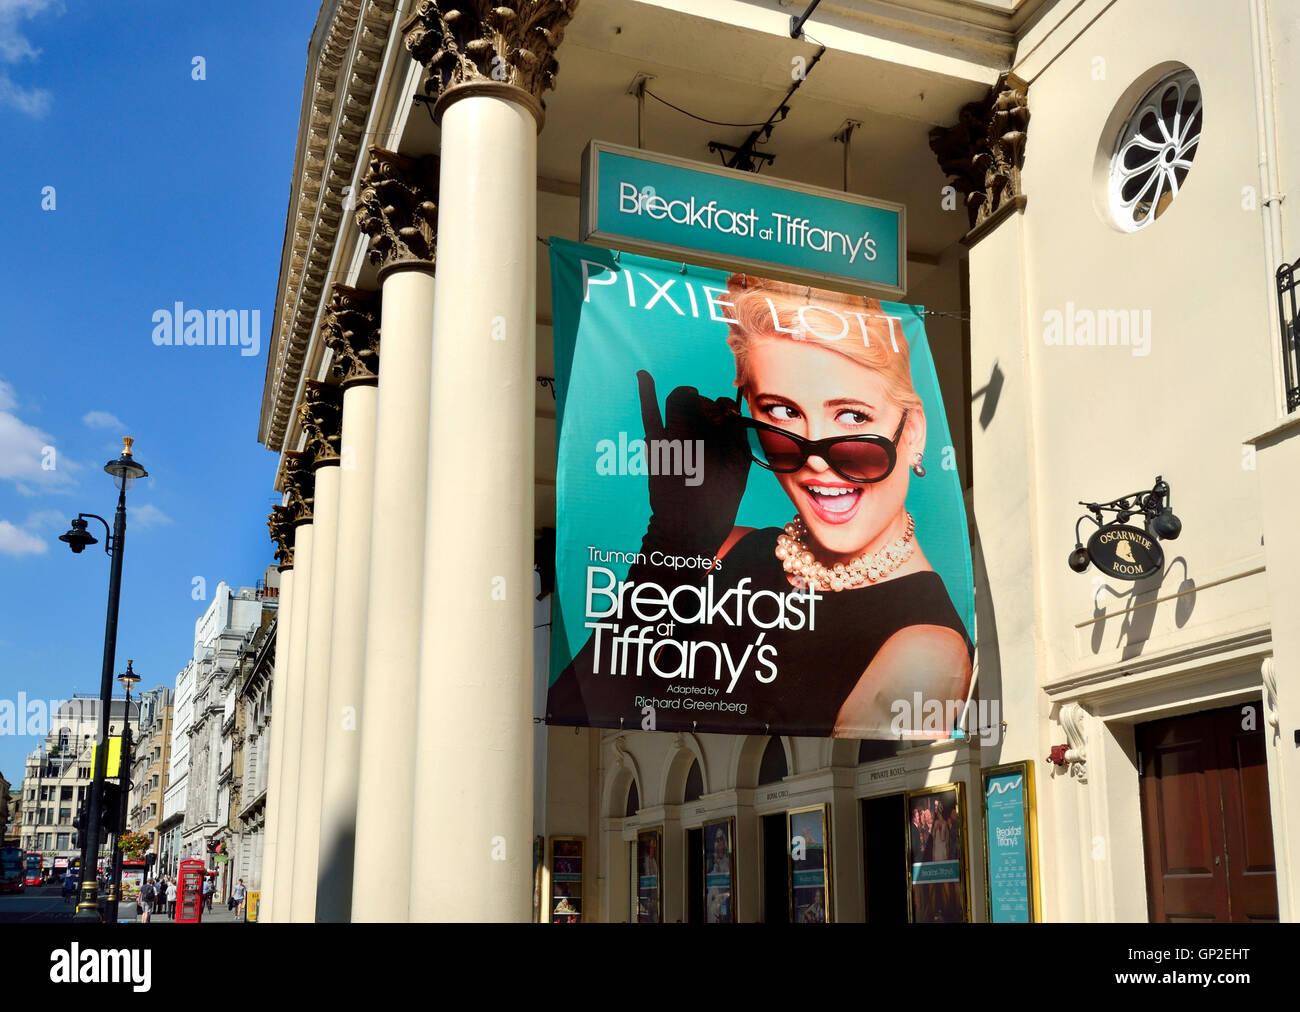 London, England, UK. Pixie Lott in Breakfast at Tiffany's a t the London Palladium, August 2016 - Stock Image